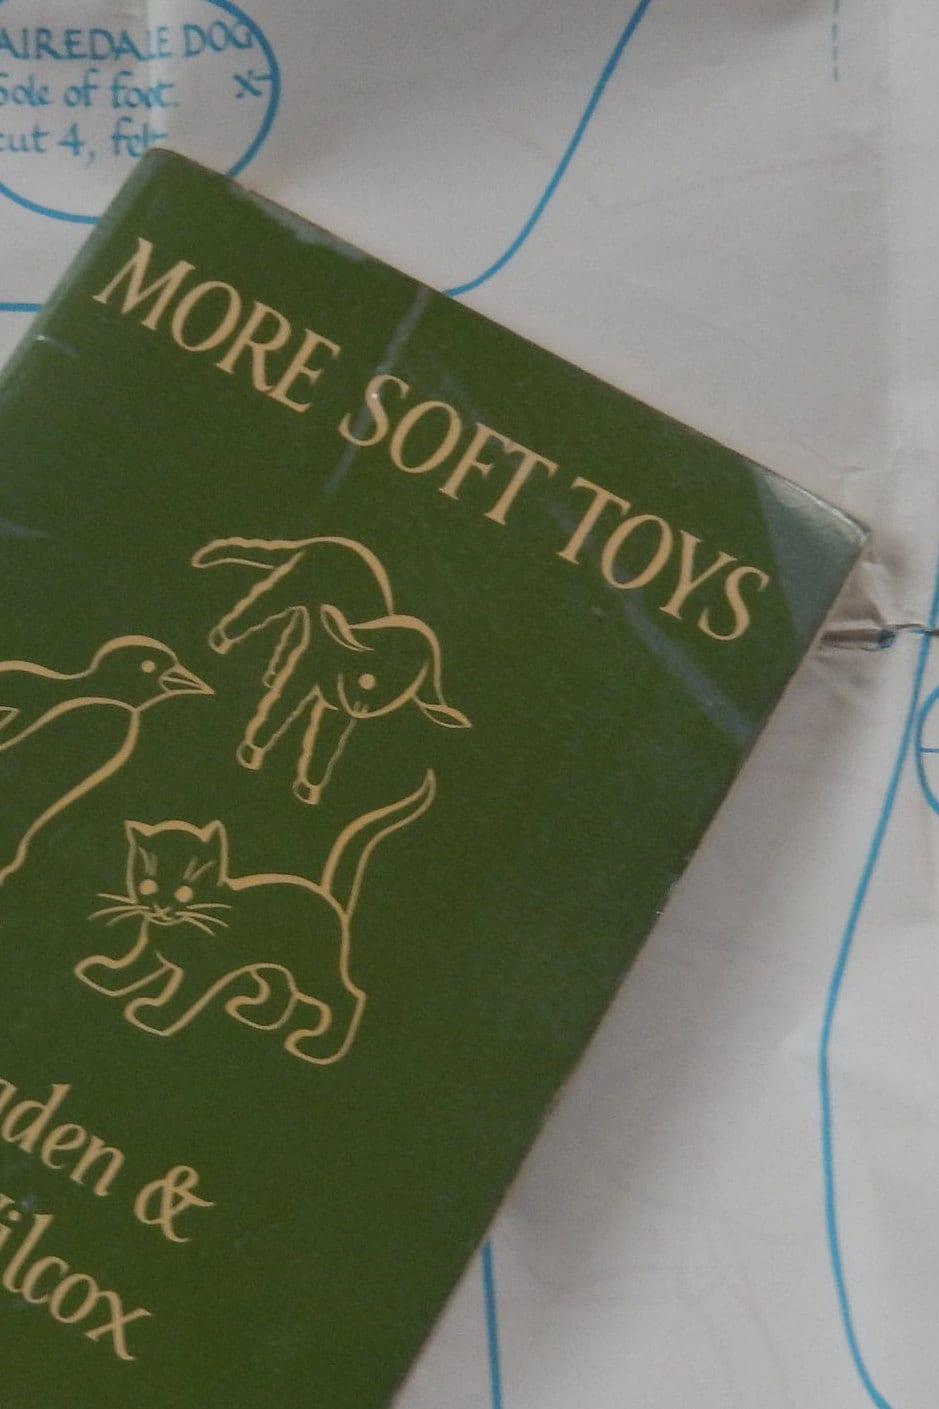 Dryad Felt Toys Craft Book, More Soft Toys by Joy Ogden Mary Wilcox, 1965 Ed. Handmade Felt Toys, How to Make Felt Toys,